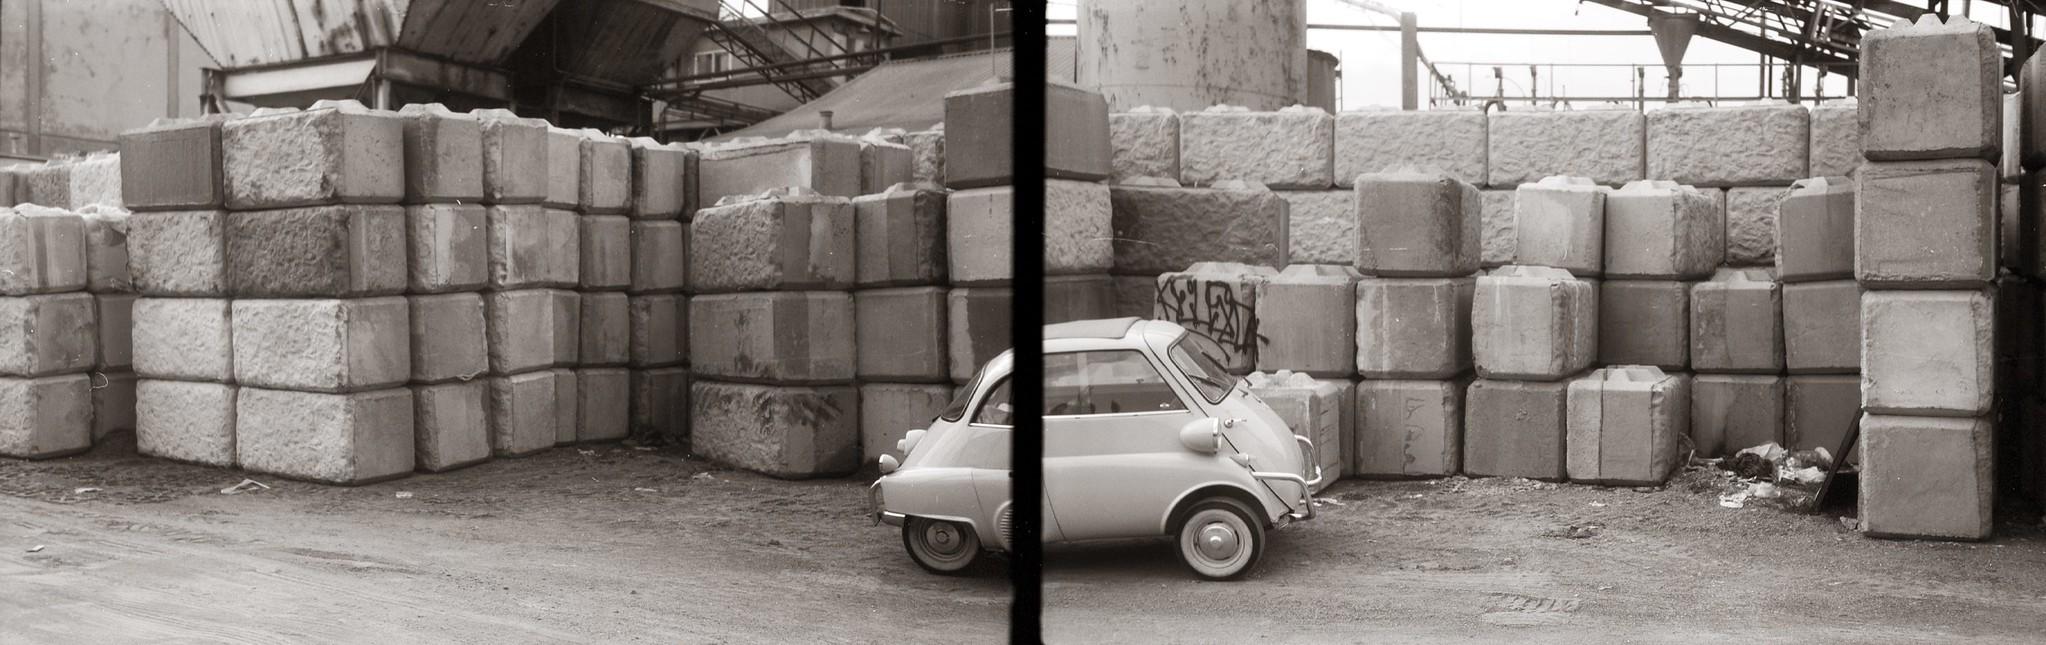 Isetta diptych | by efo